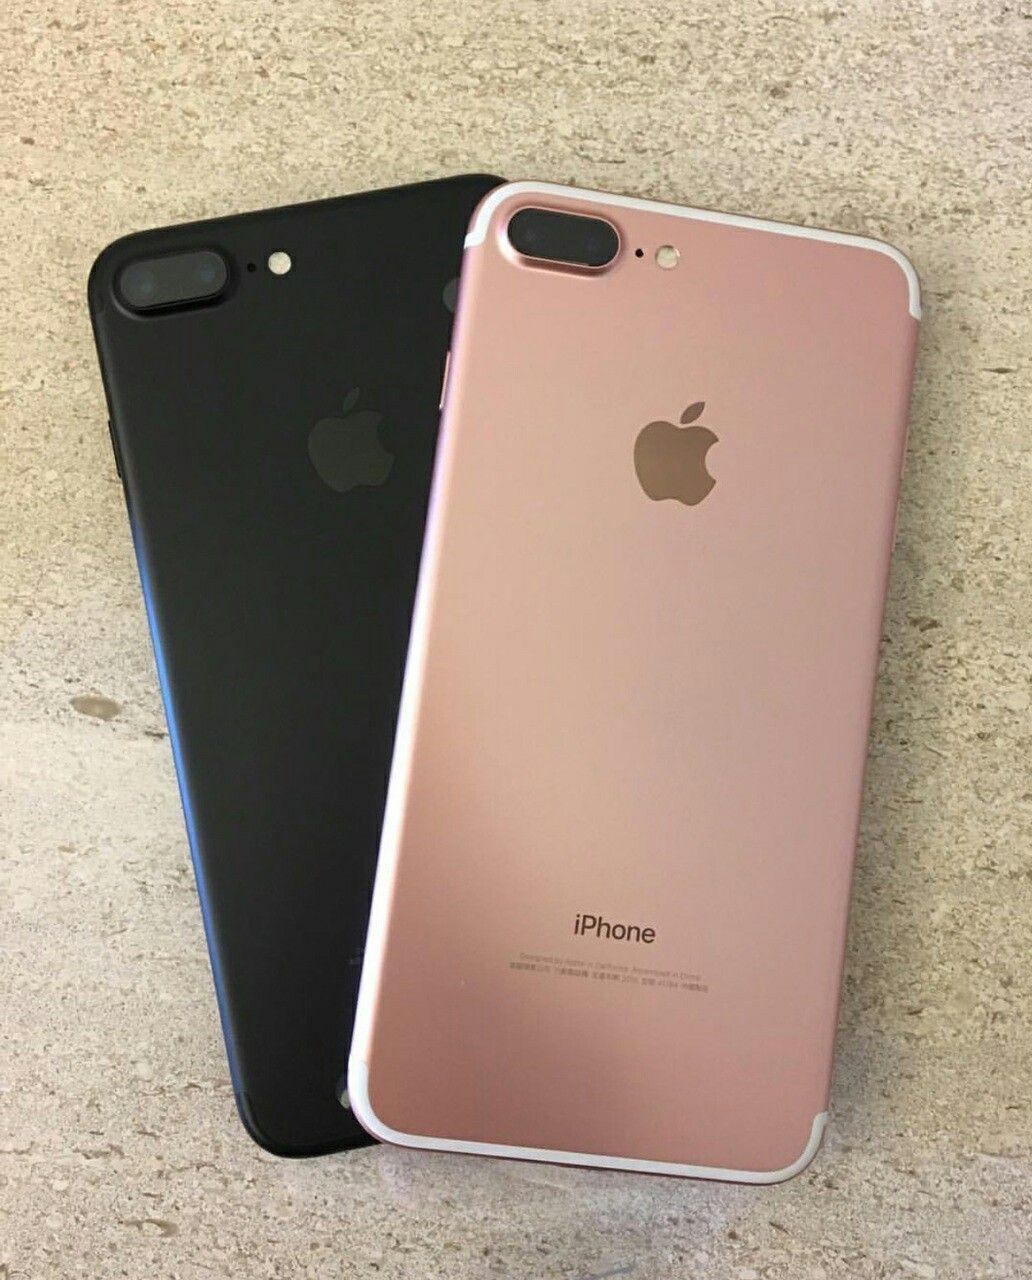 iphone 7 matte black vs rose gold